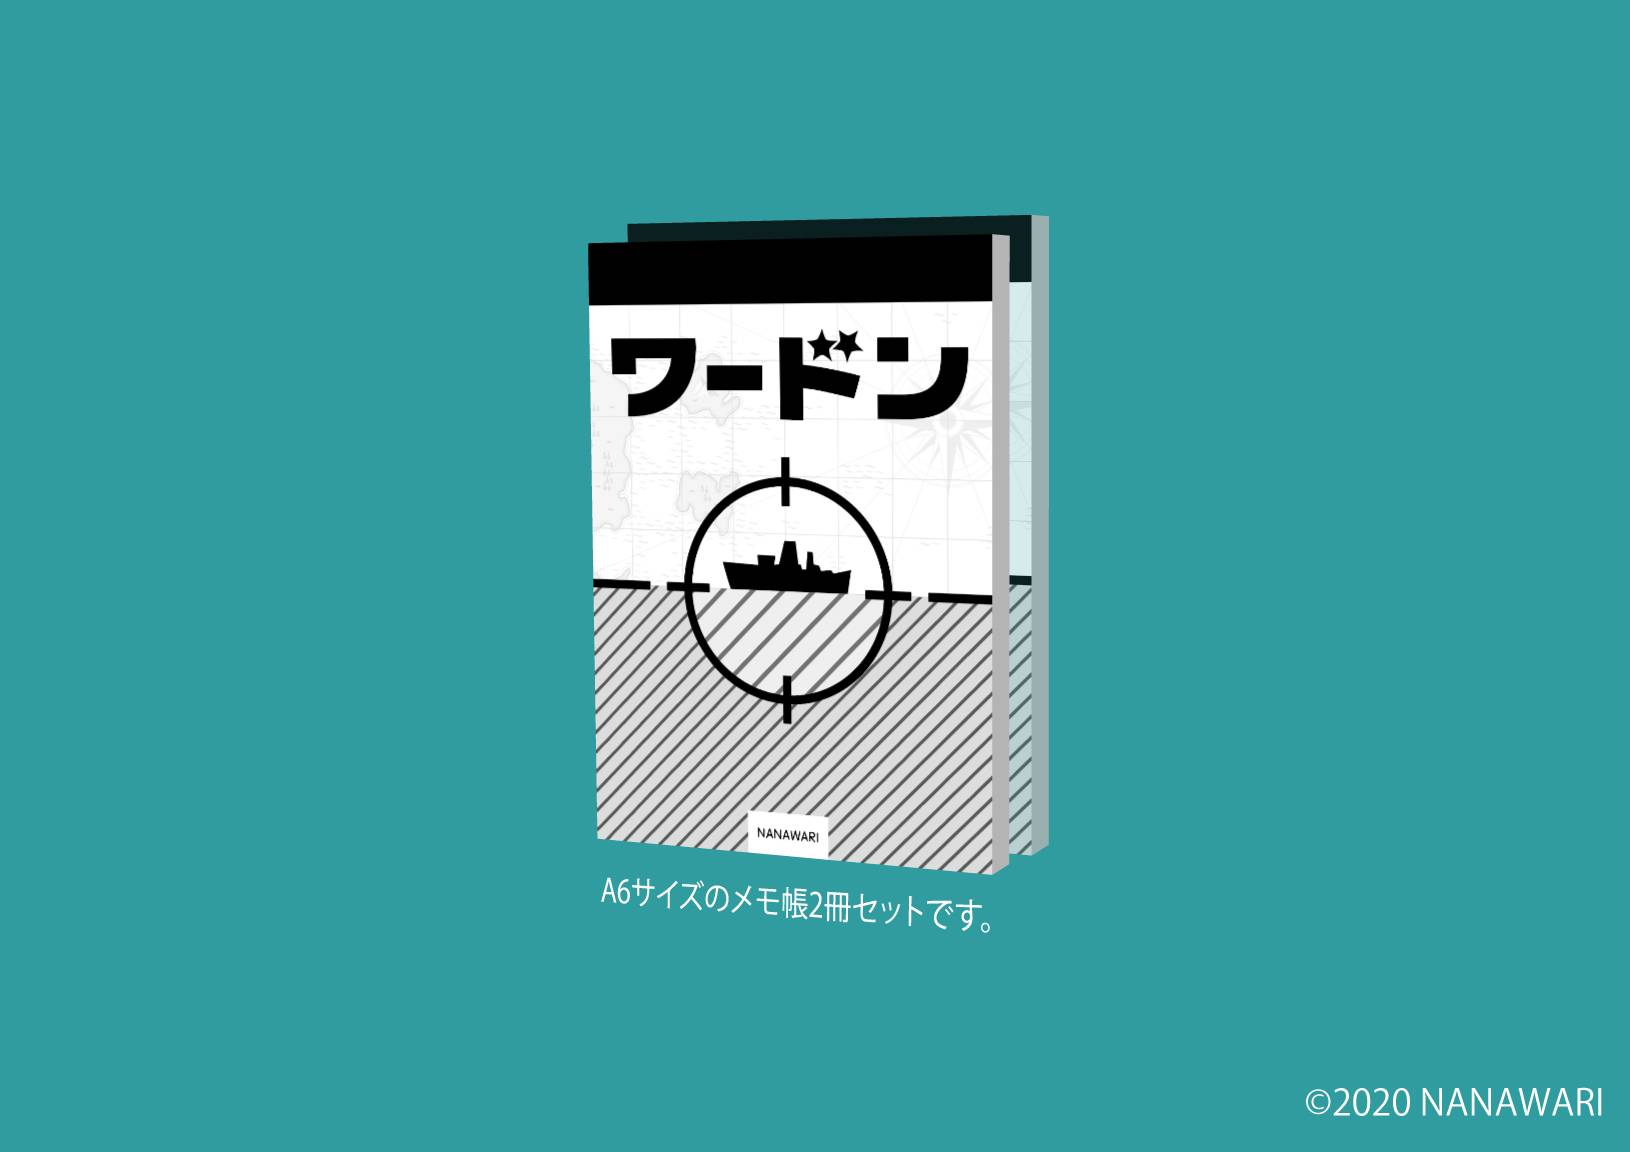 【D06】daitai/ナナワリ ブースと販売物のご案内